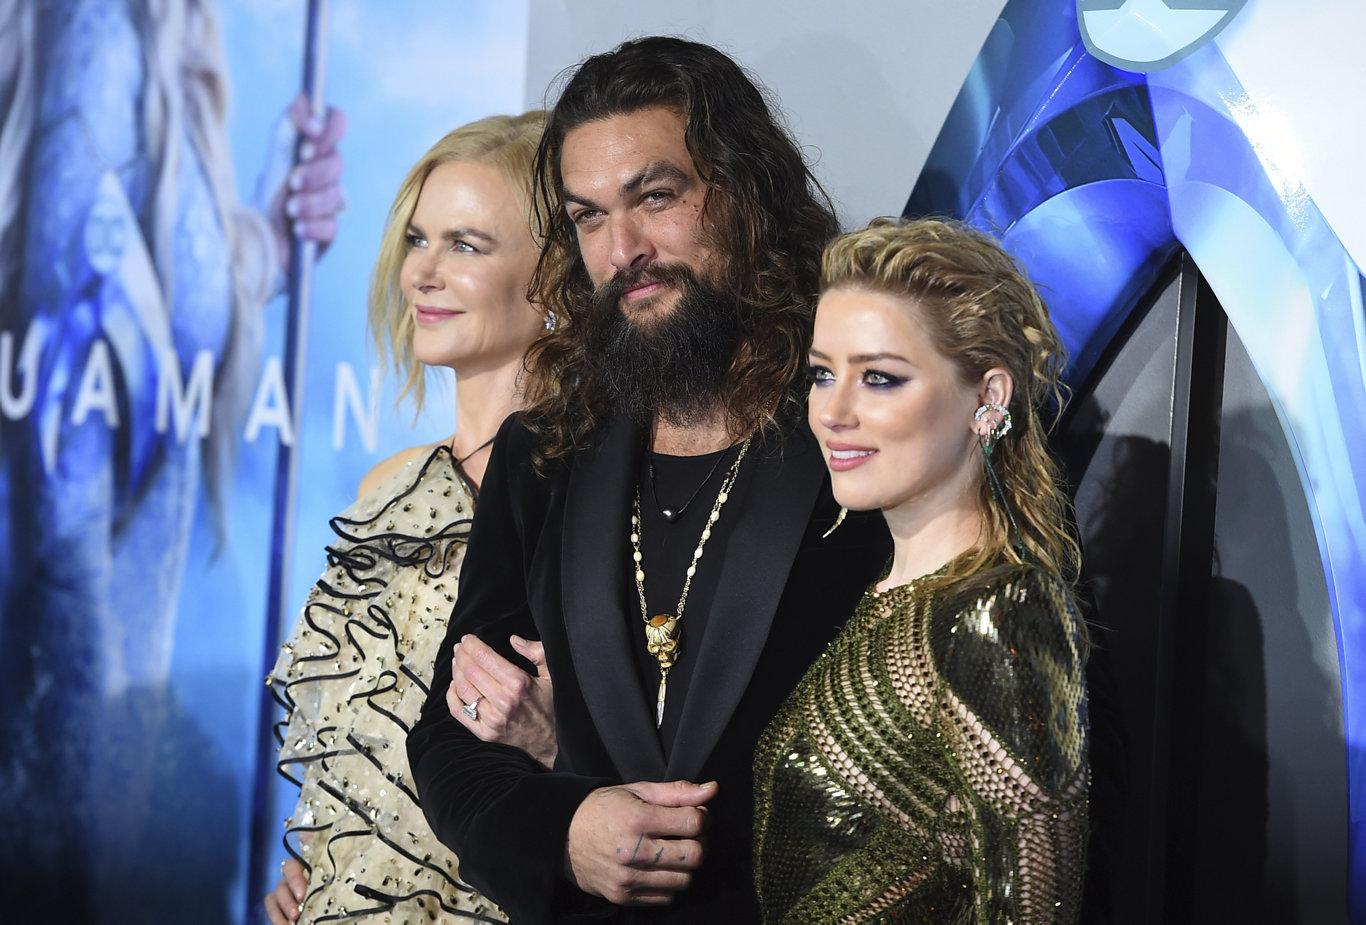 Jason Momoa with Aquaman's fierce females Nicole Kidman and Amber Heard.